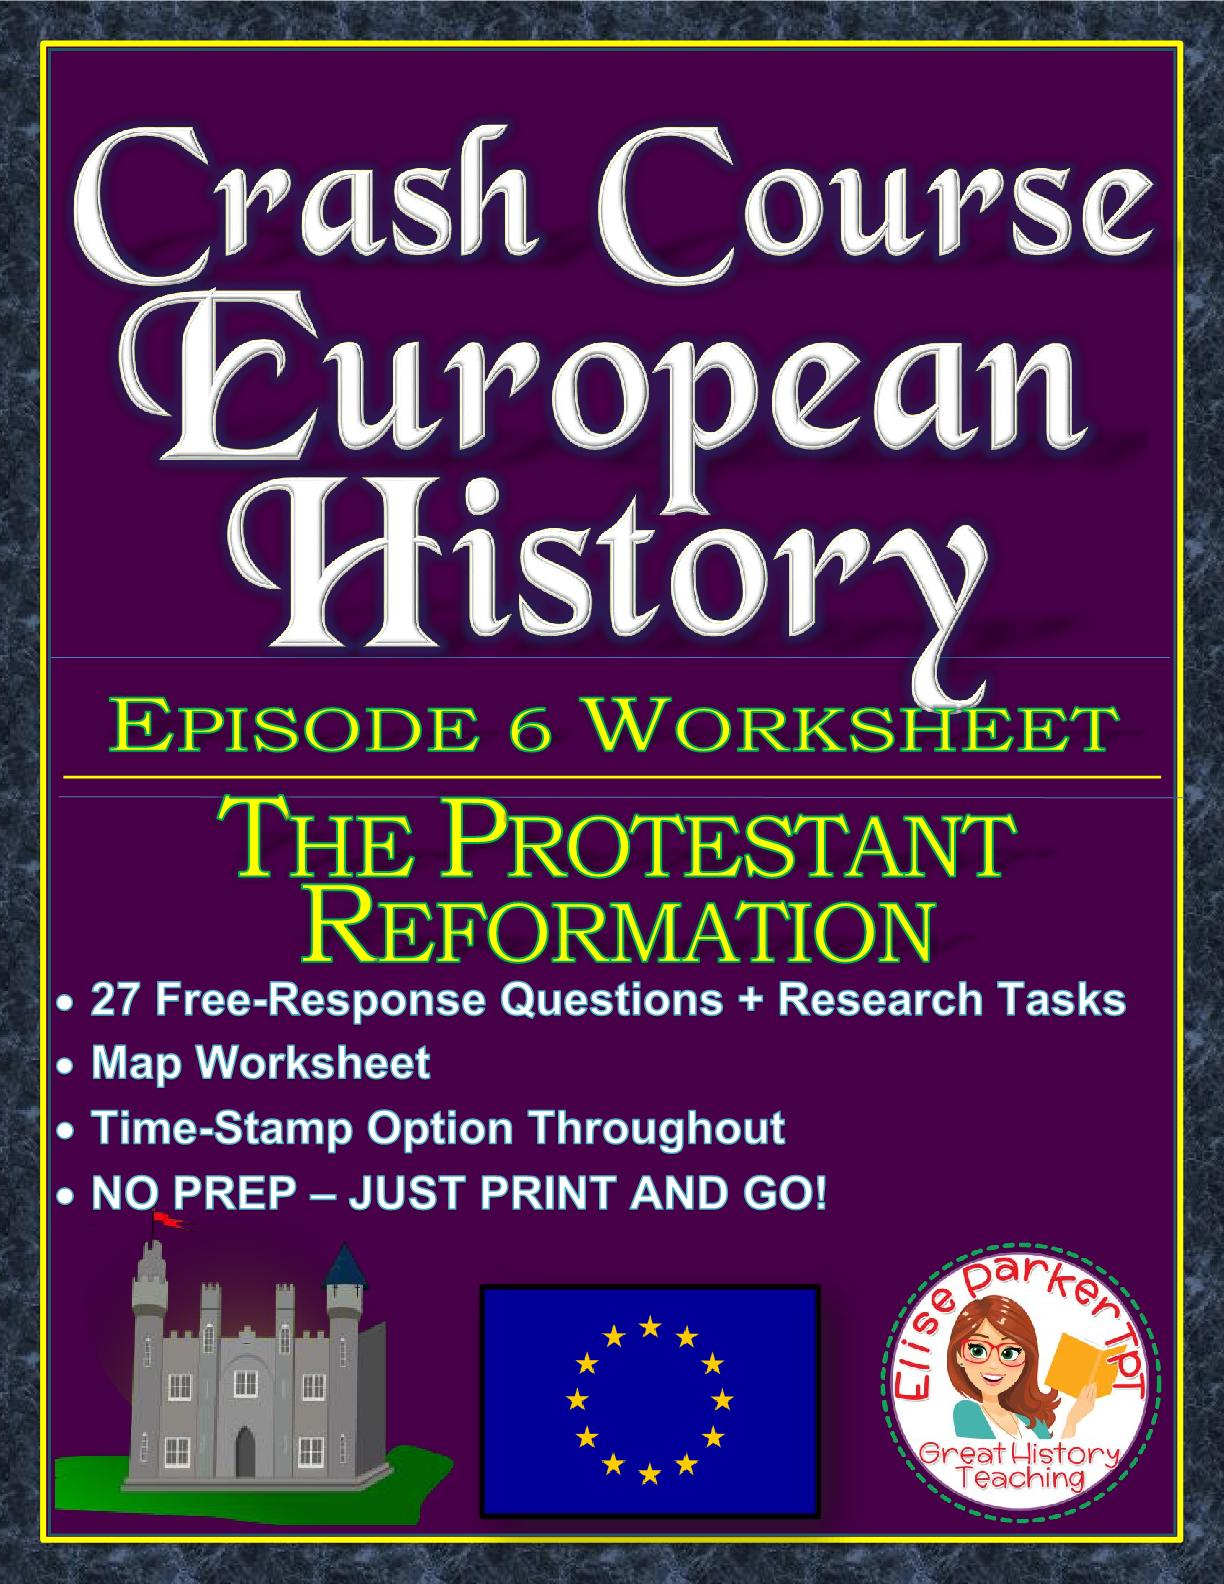 Crash Course European History Episode 6 Worksheet